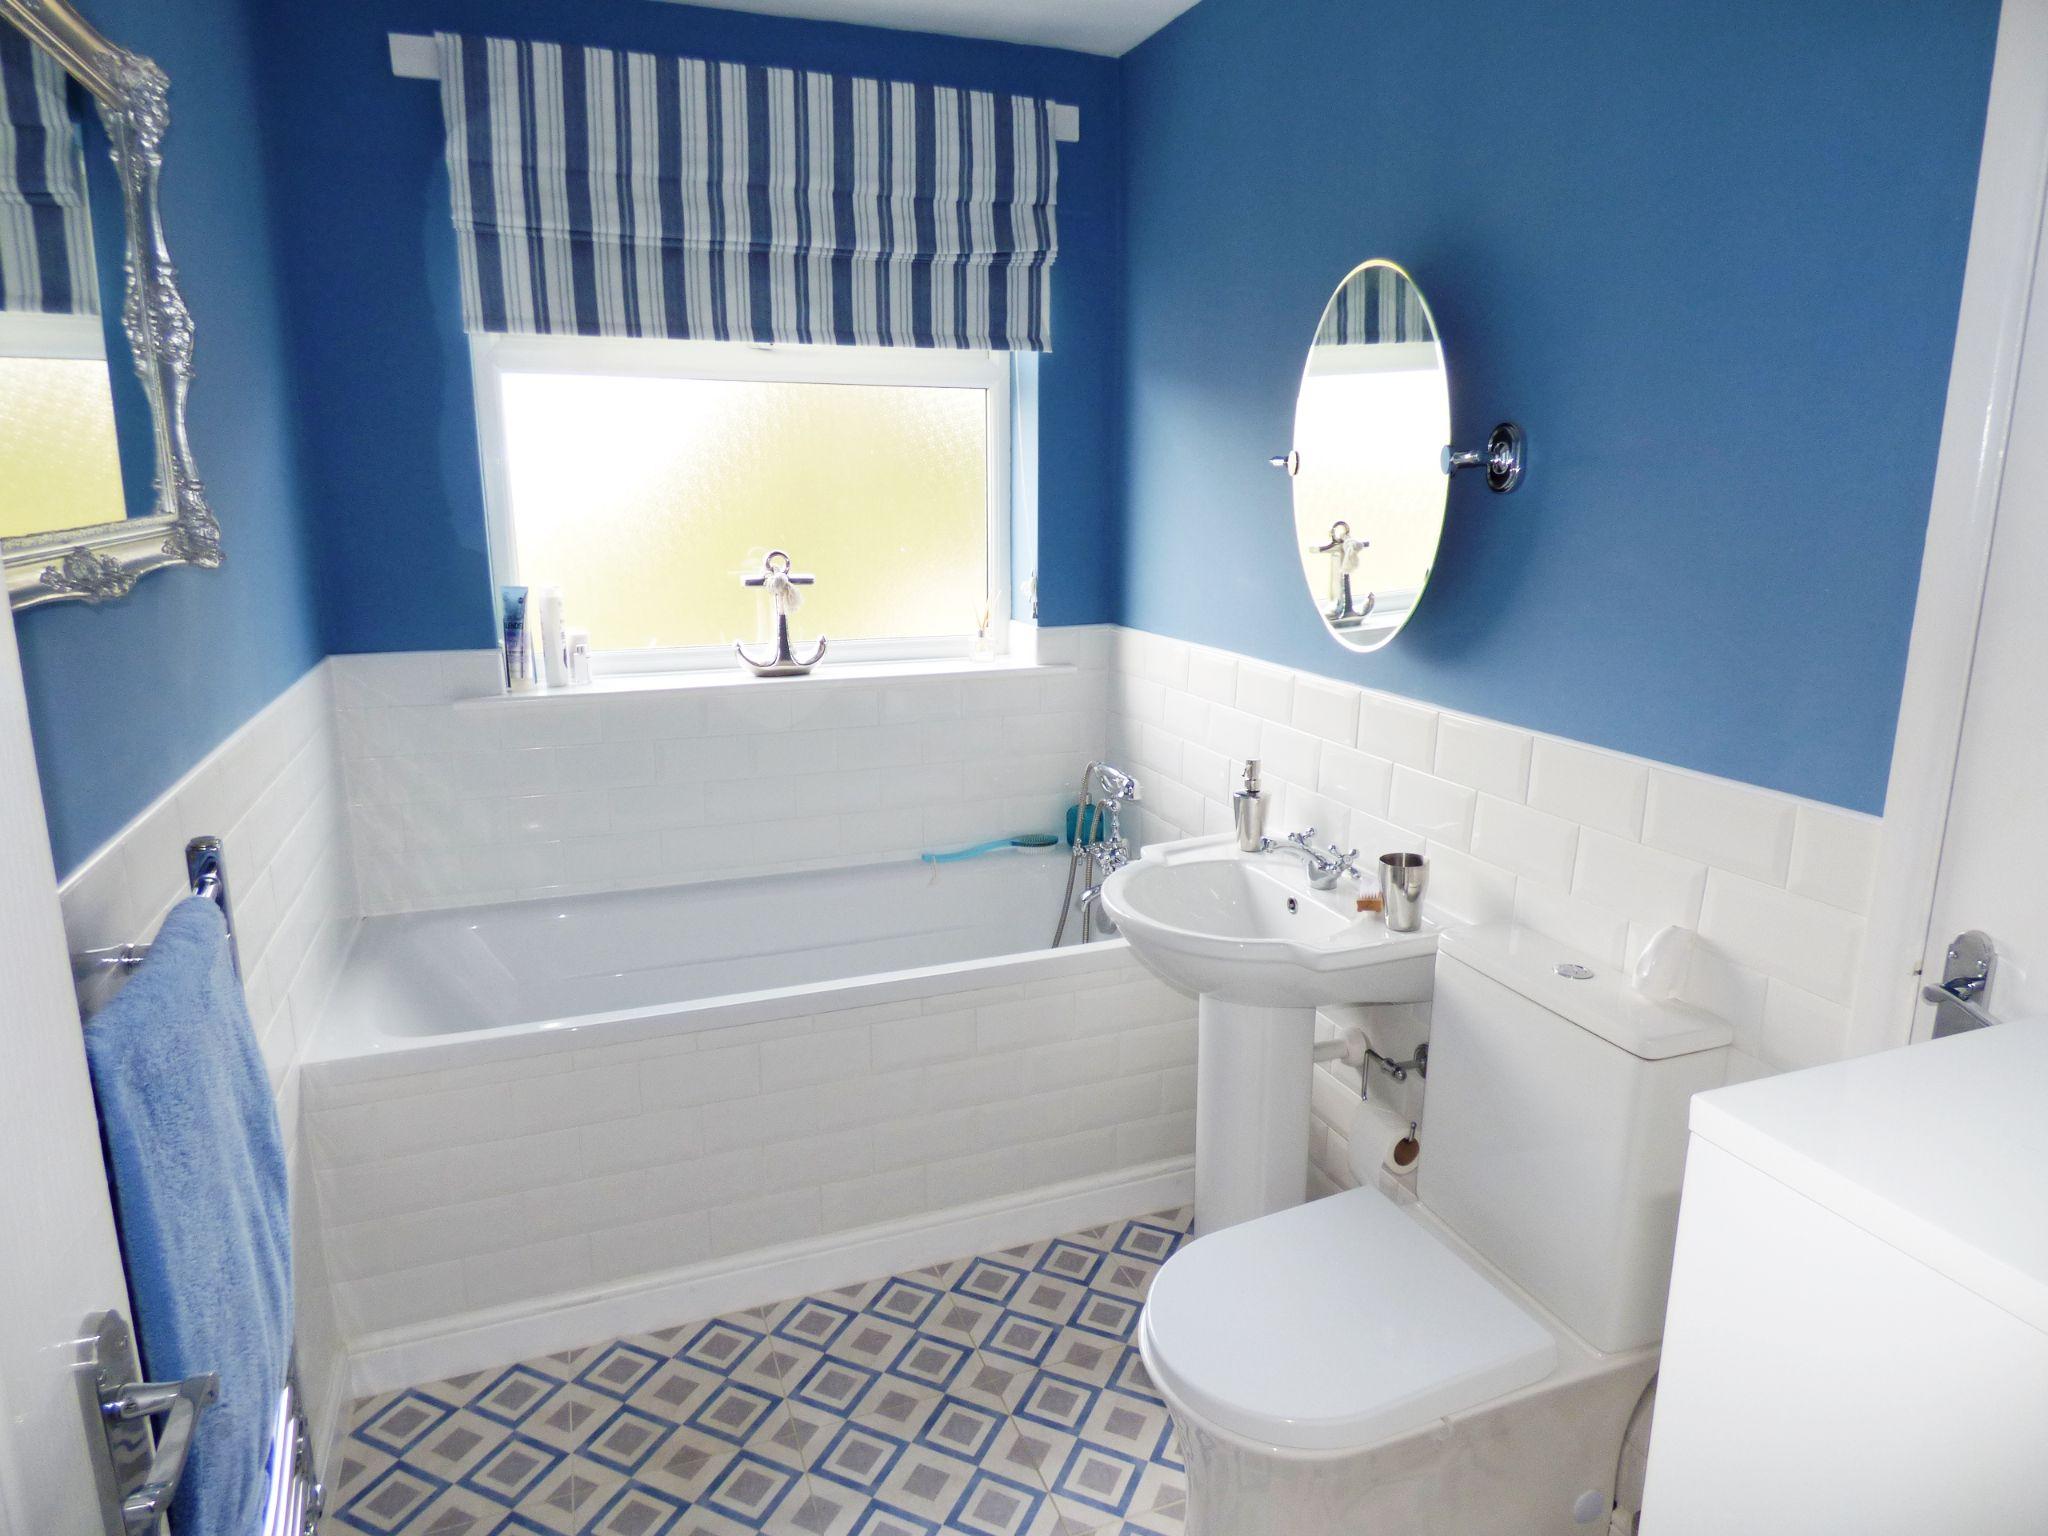 4 Bedroom Detached House For Sale - Bathroom